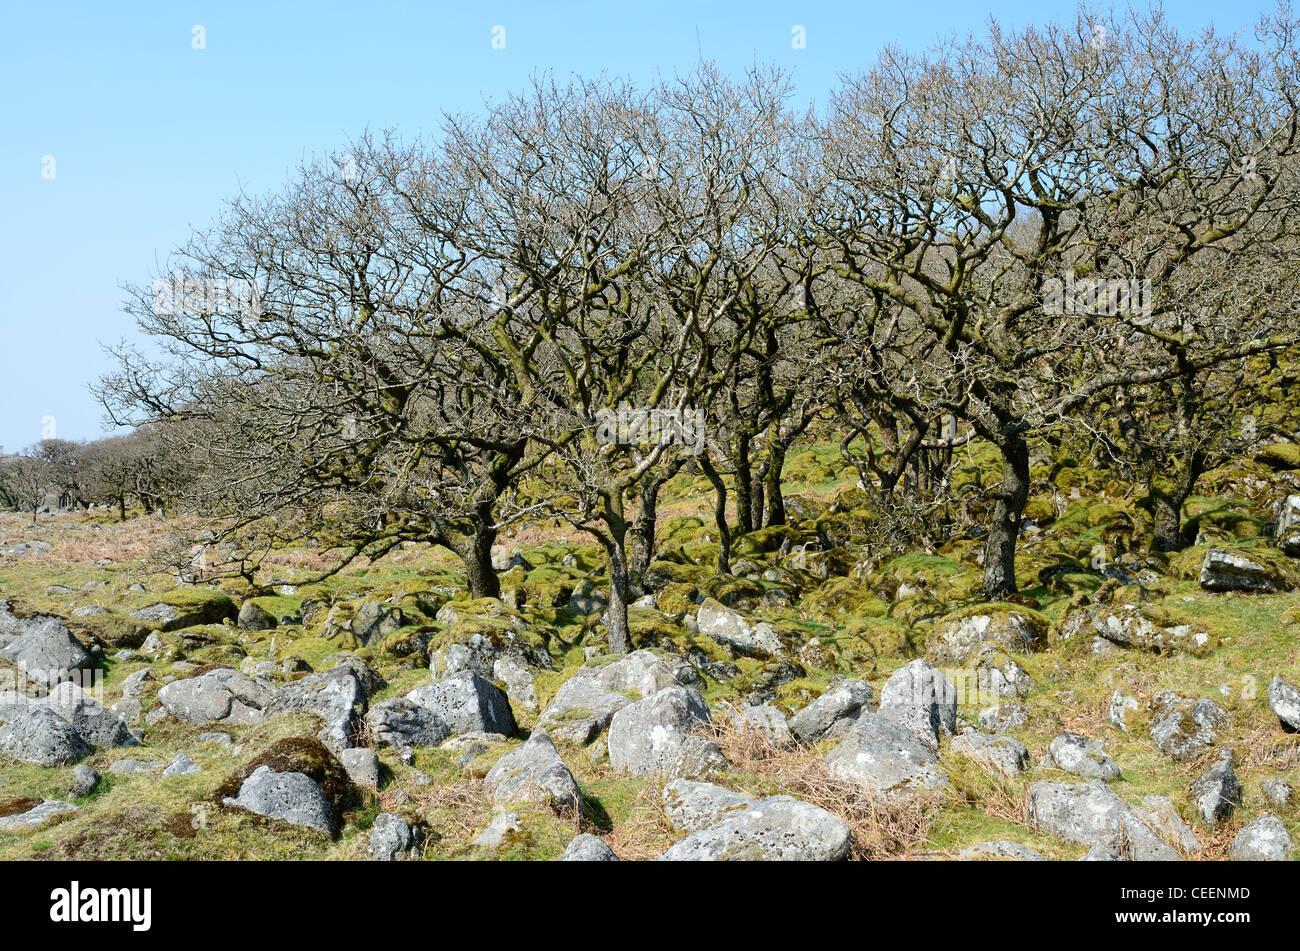 Stunted Oak Trees at Black-a-tor Copse, Dartmoor, Devon - Stock Image